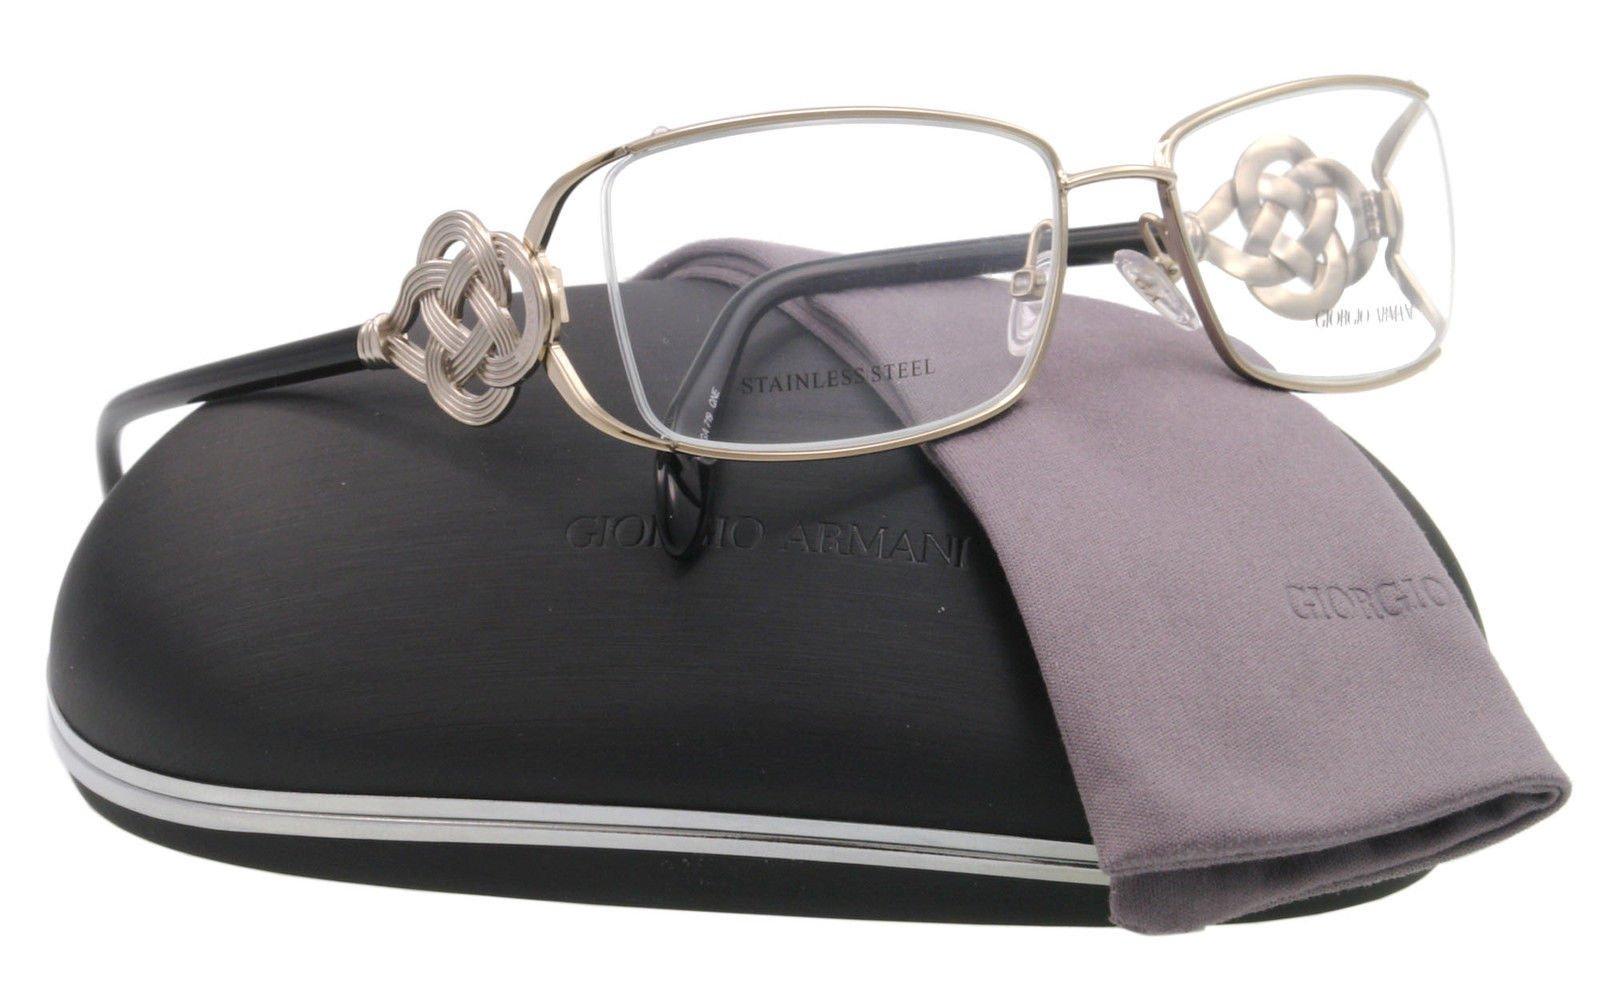 NEW Giorgio Armani Eyeglasses GA 719 Silver QNE GA719 52mm